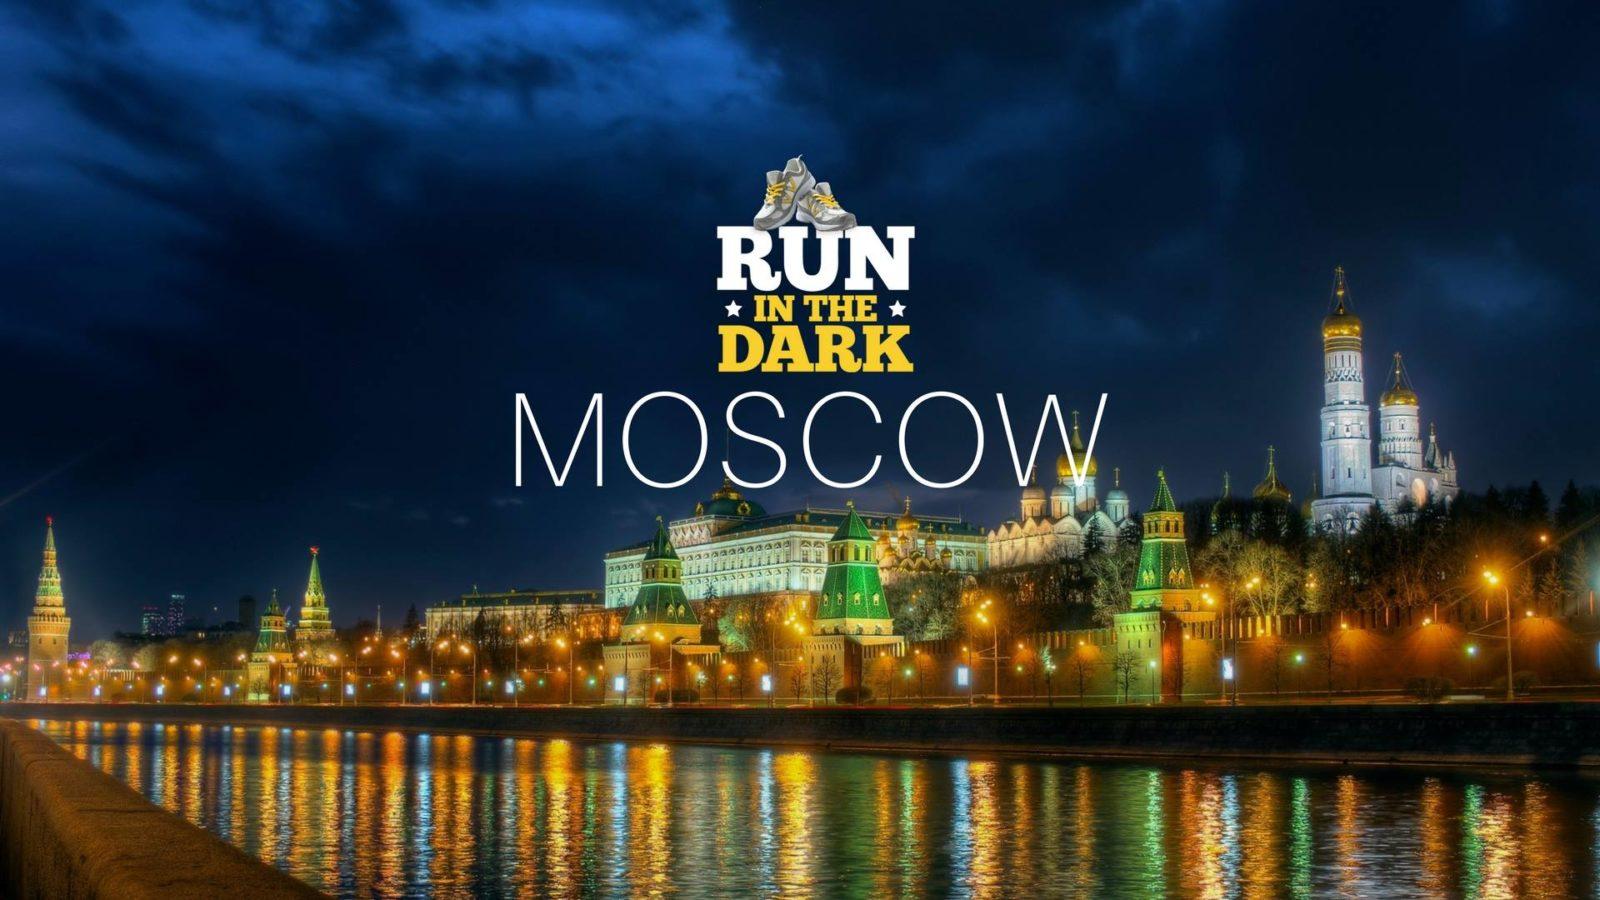 RUN IN THE DARK ПРОЙДЕТ В МОСКВЕ